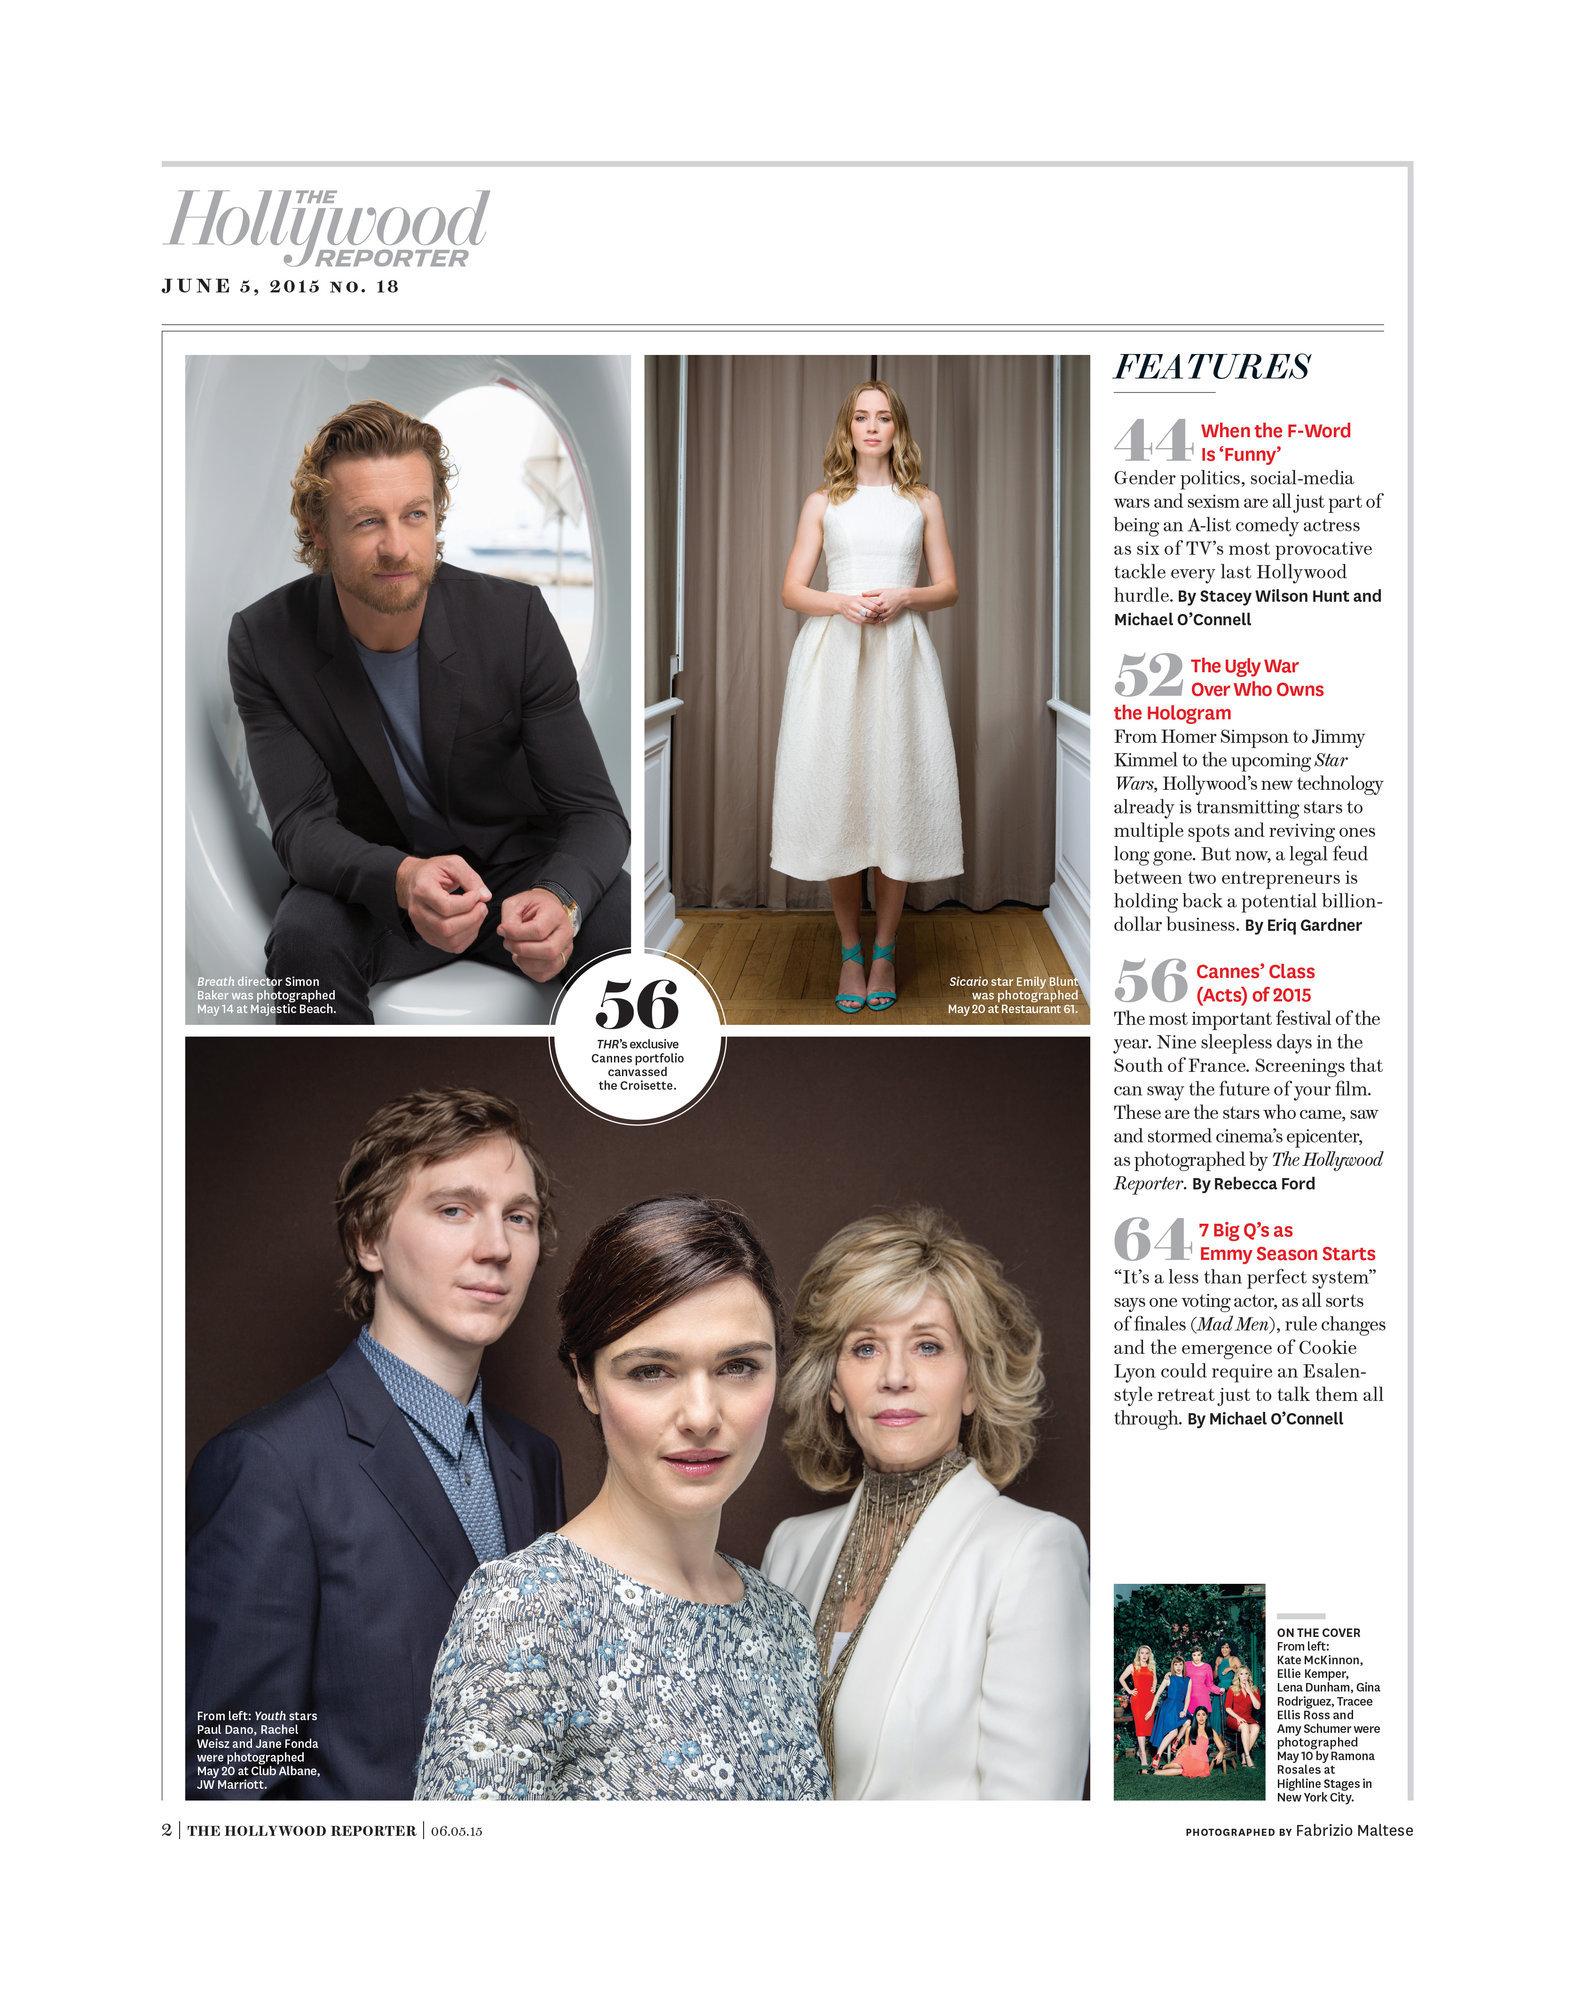 THR Cannes index.jpg